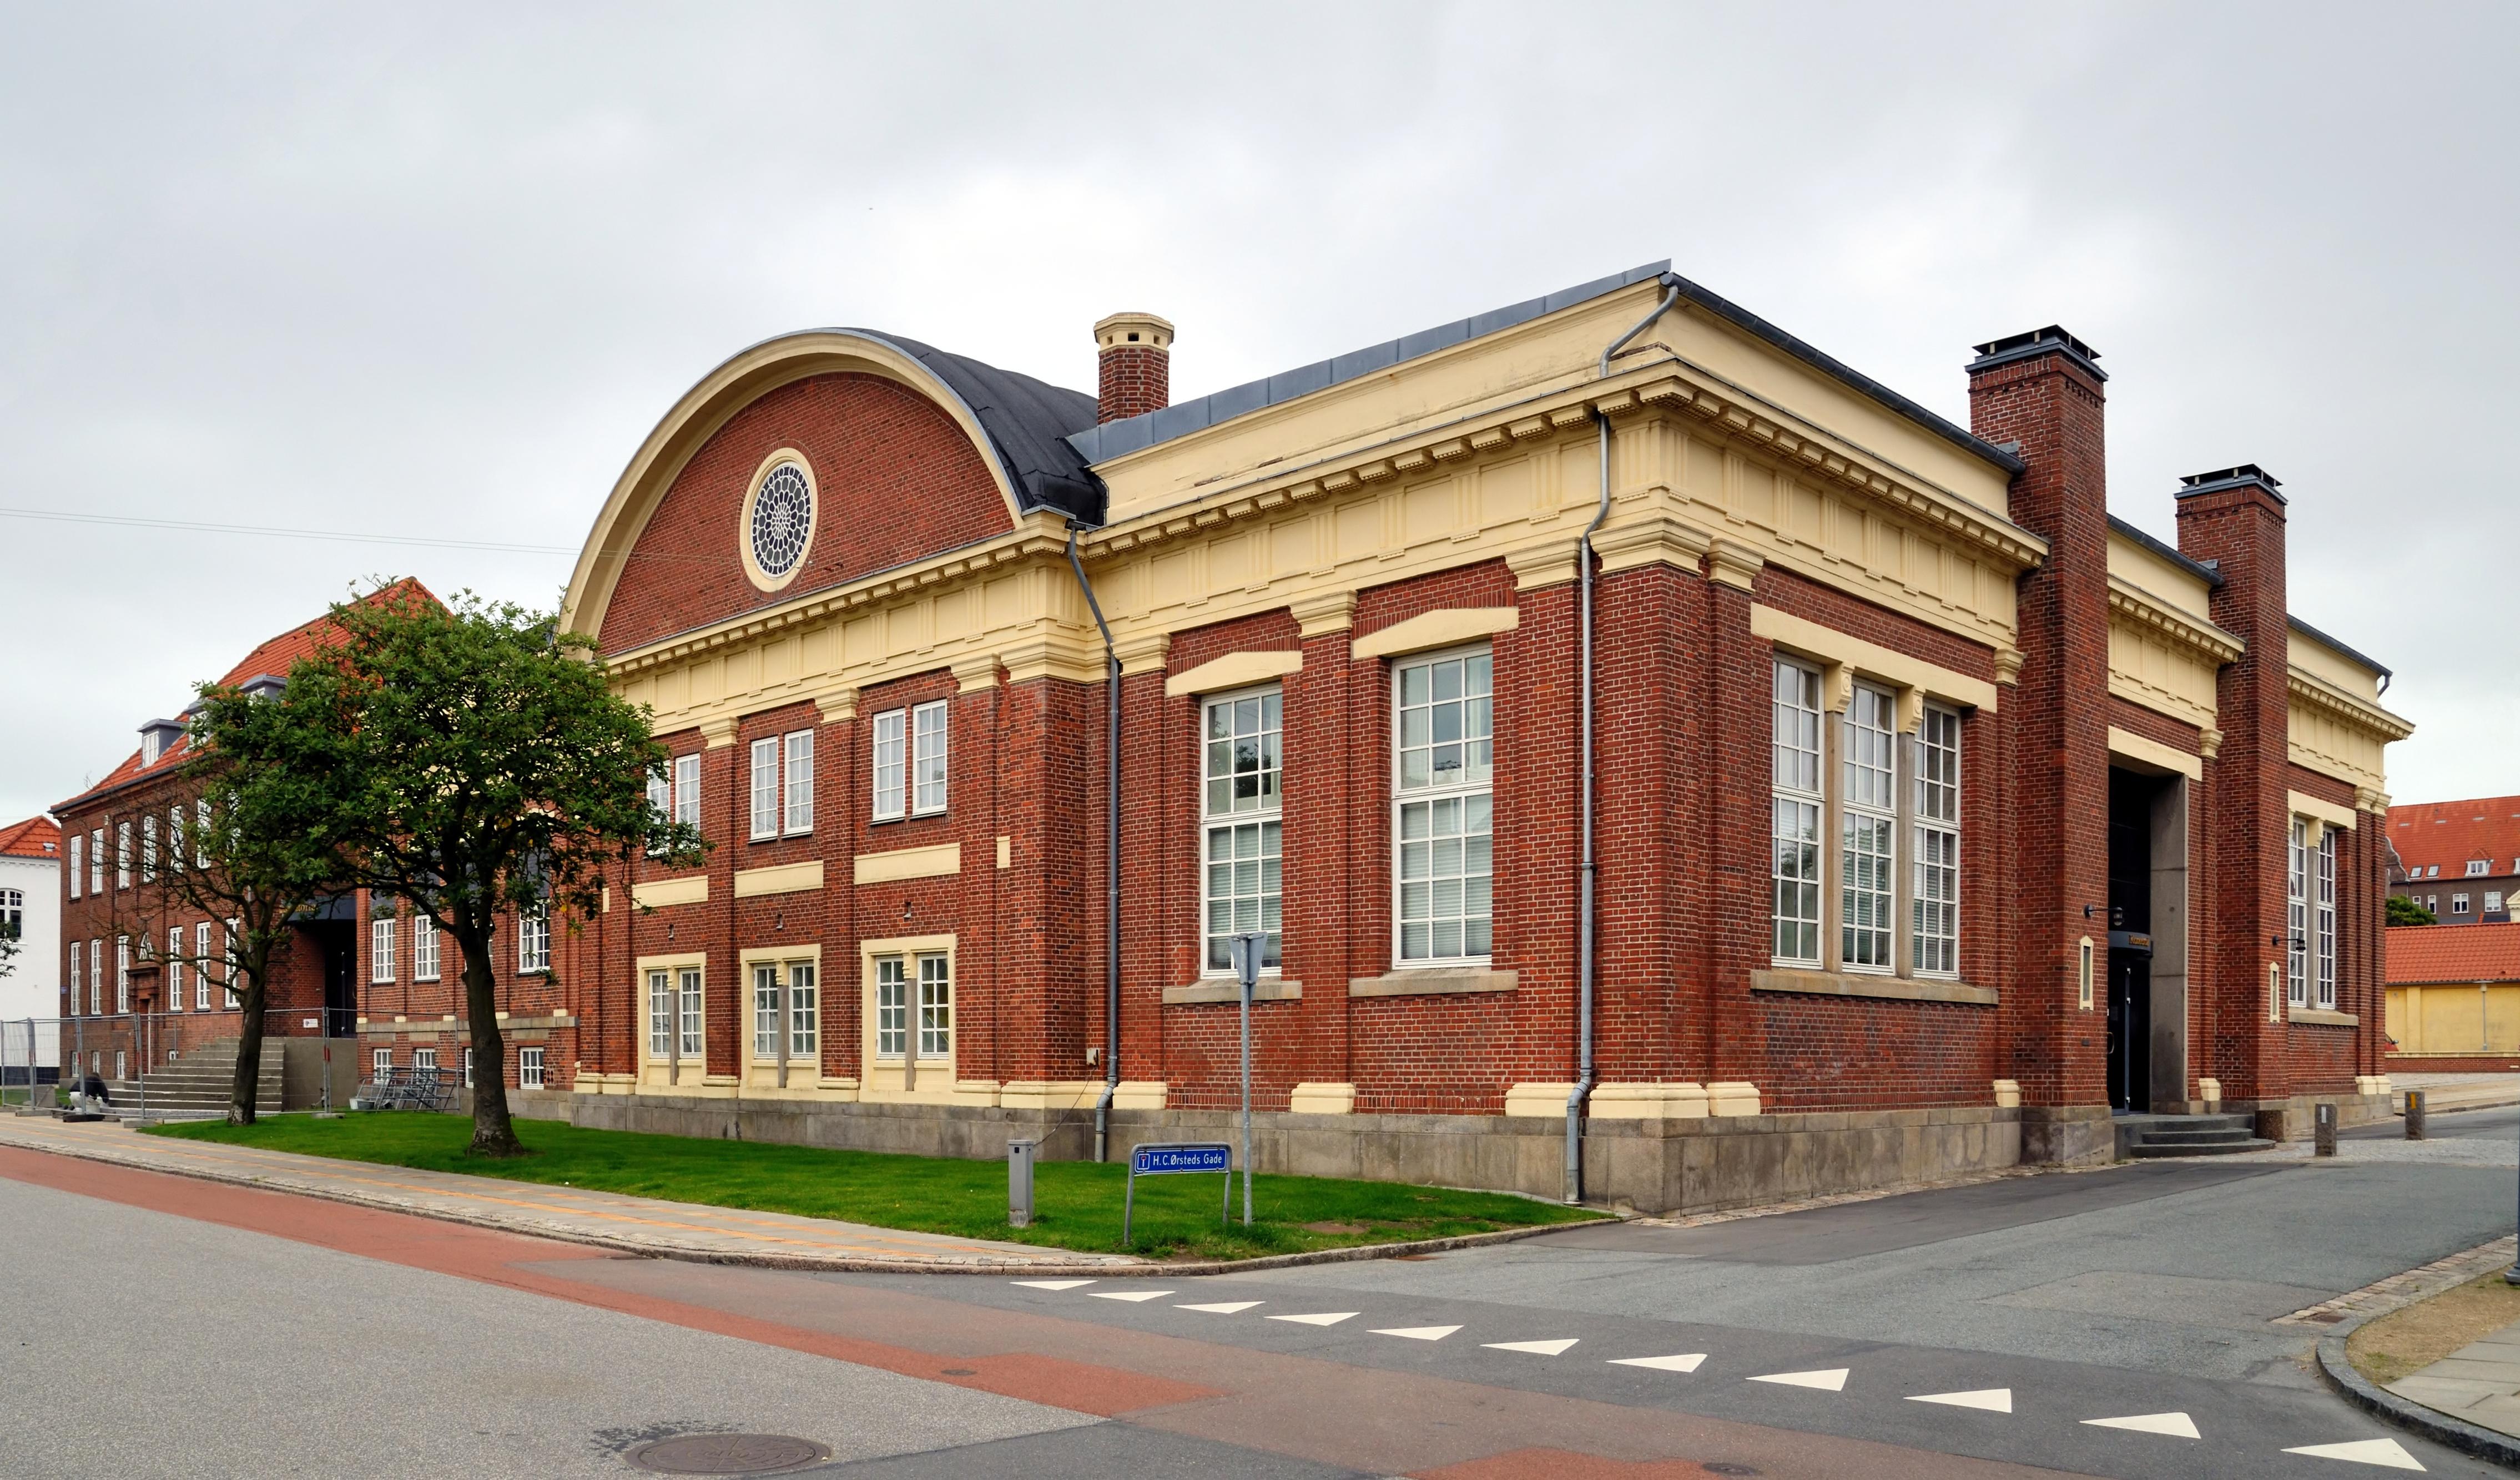 1%2f1f%2fesbjerg   musikkonservatorium2